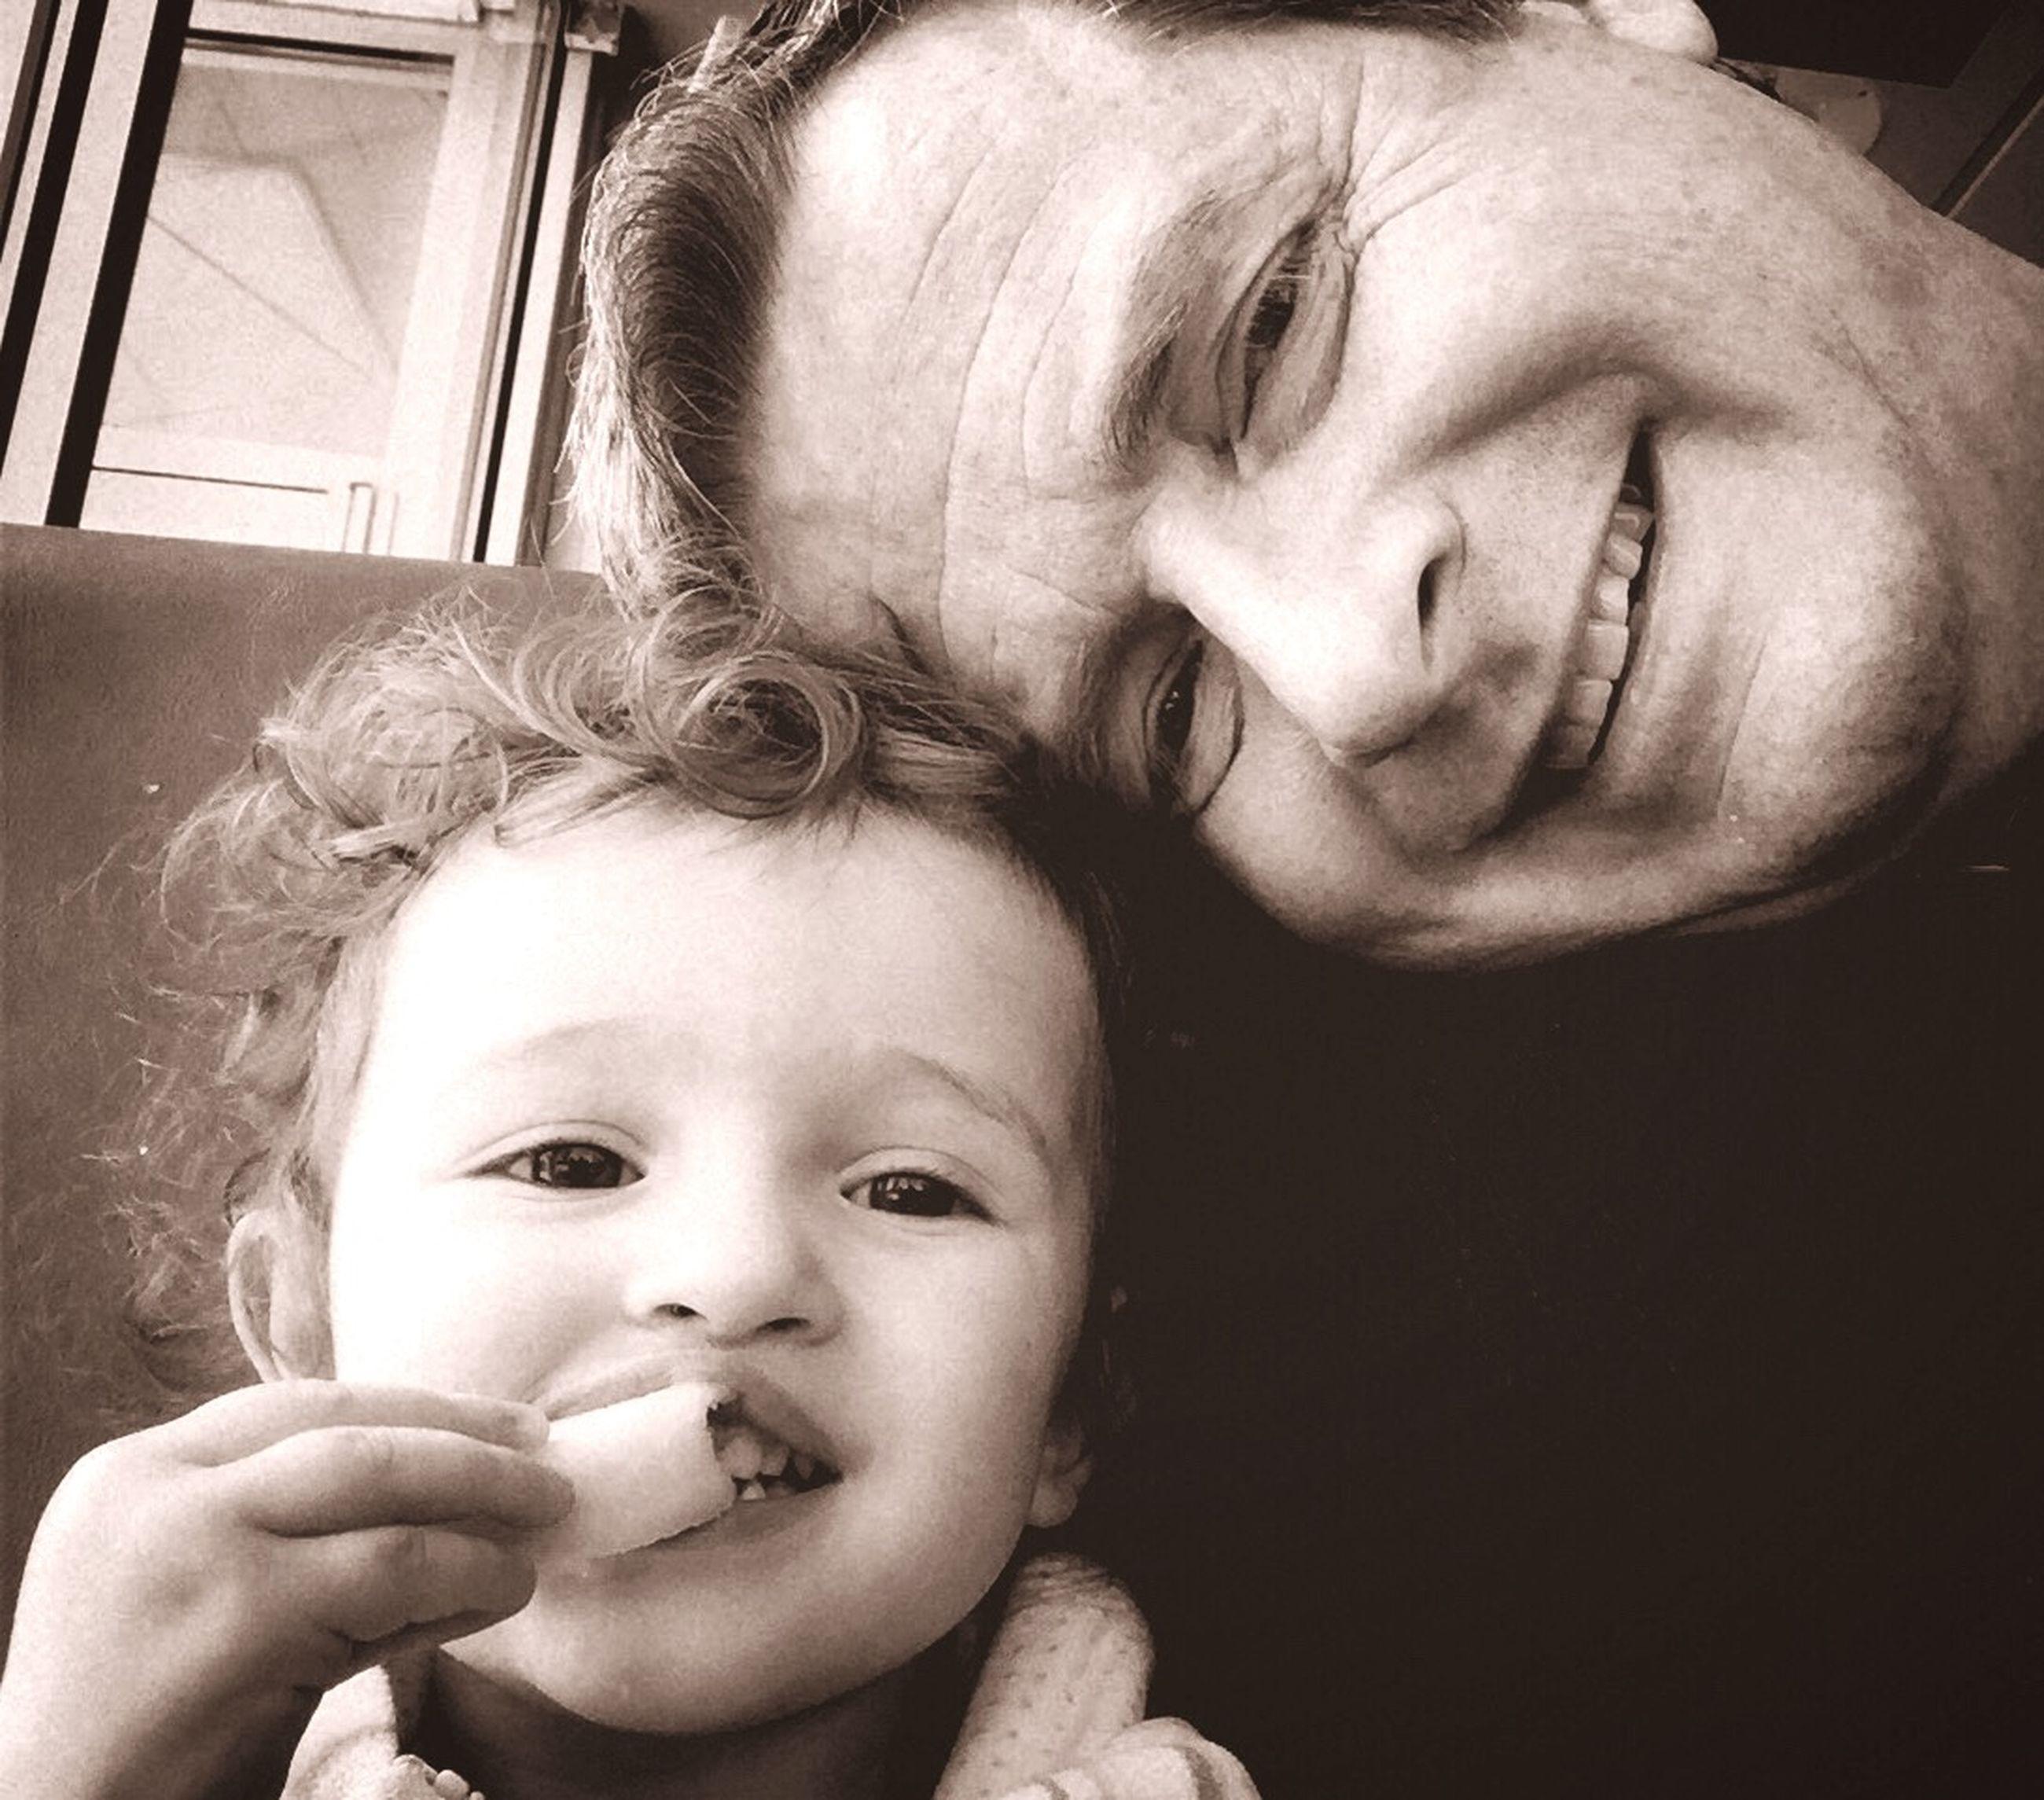 childhood, person, innocence, elementary age, cute, indoors, boys, baby, toddler, headshot, babyhood, lifestyles, girls, bonding, togetherness, portrait, leisure activity, love